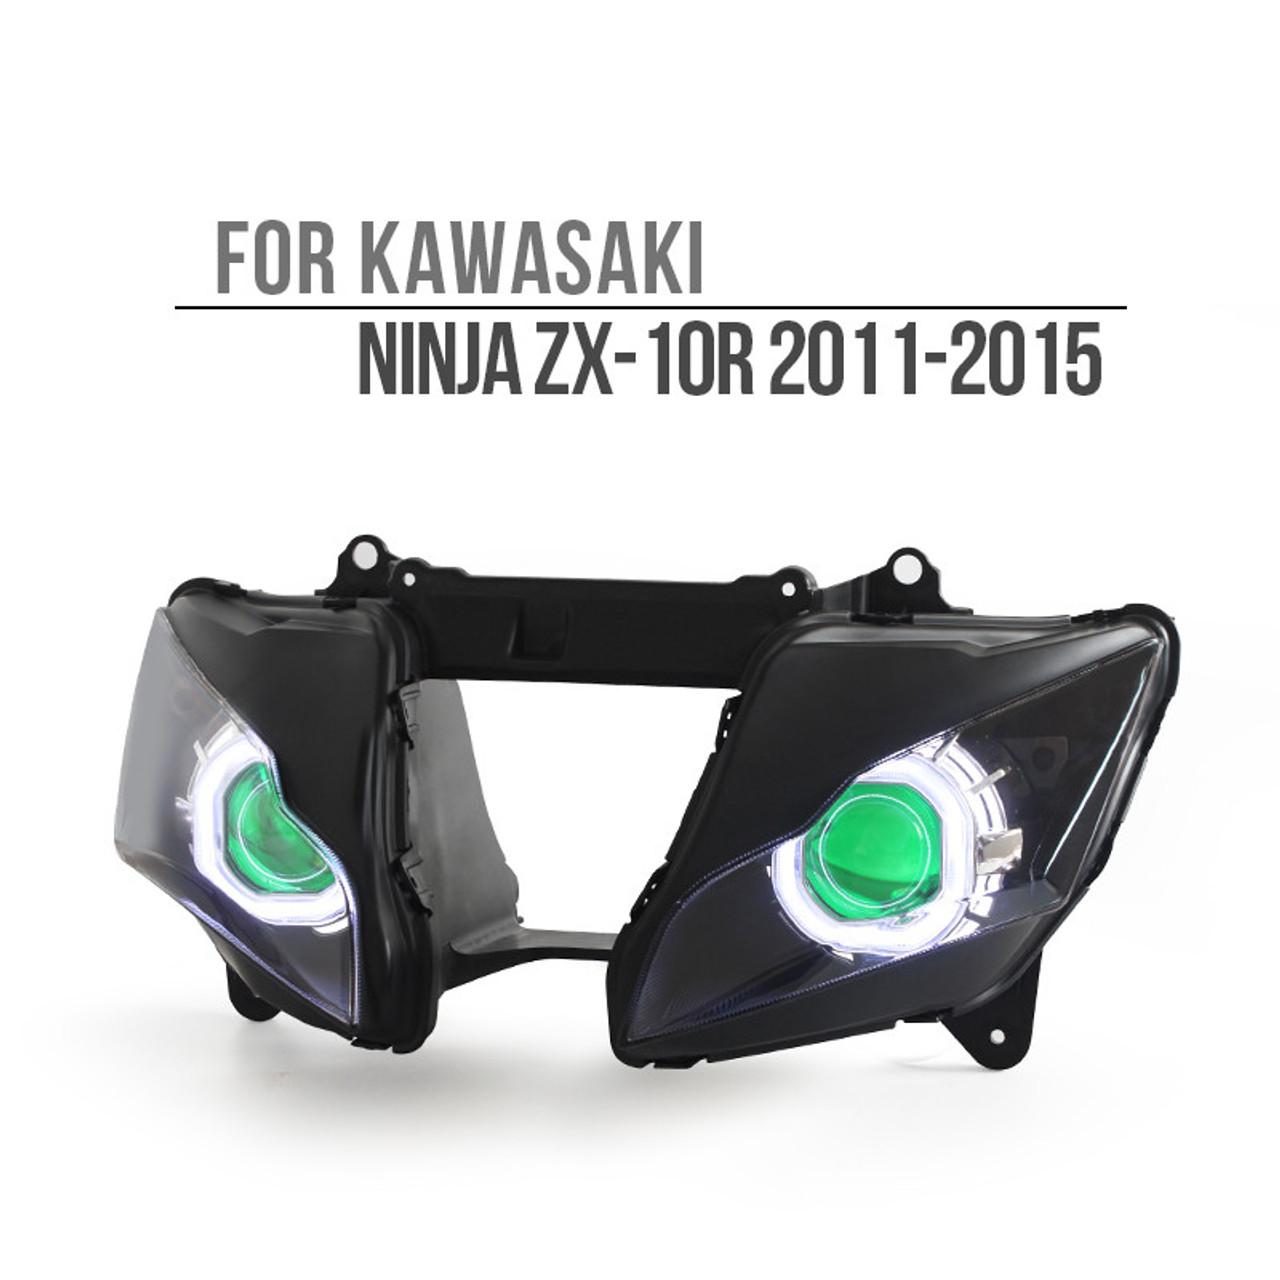 Fit for Kawasaki Ninja ZX10R 2011-2015 Dual LED Angel Eye Headlight  Assembly (Square)